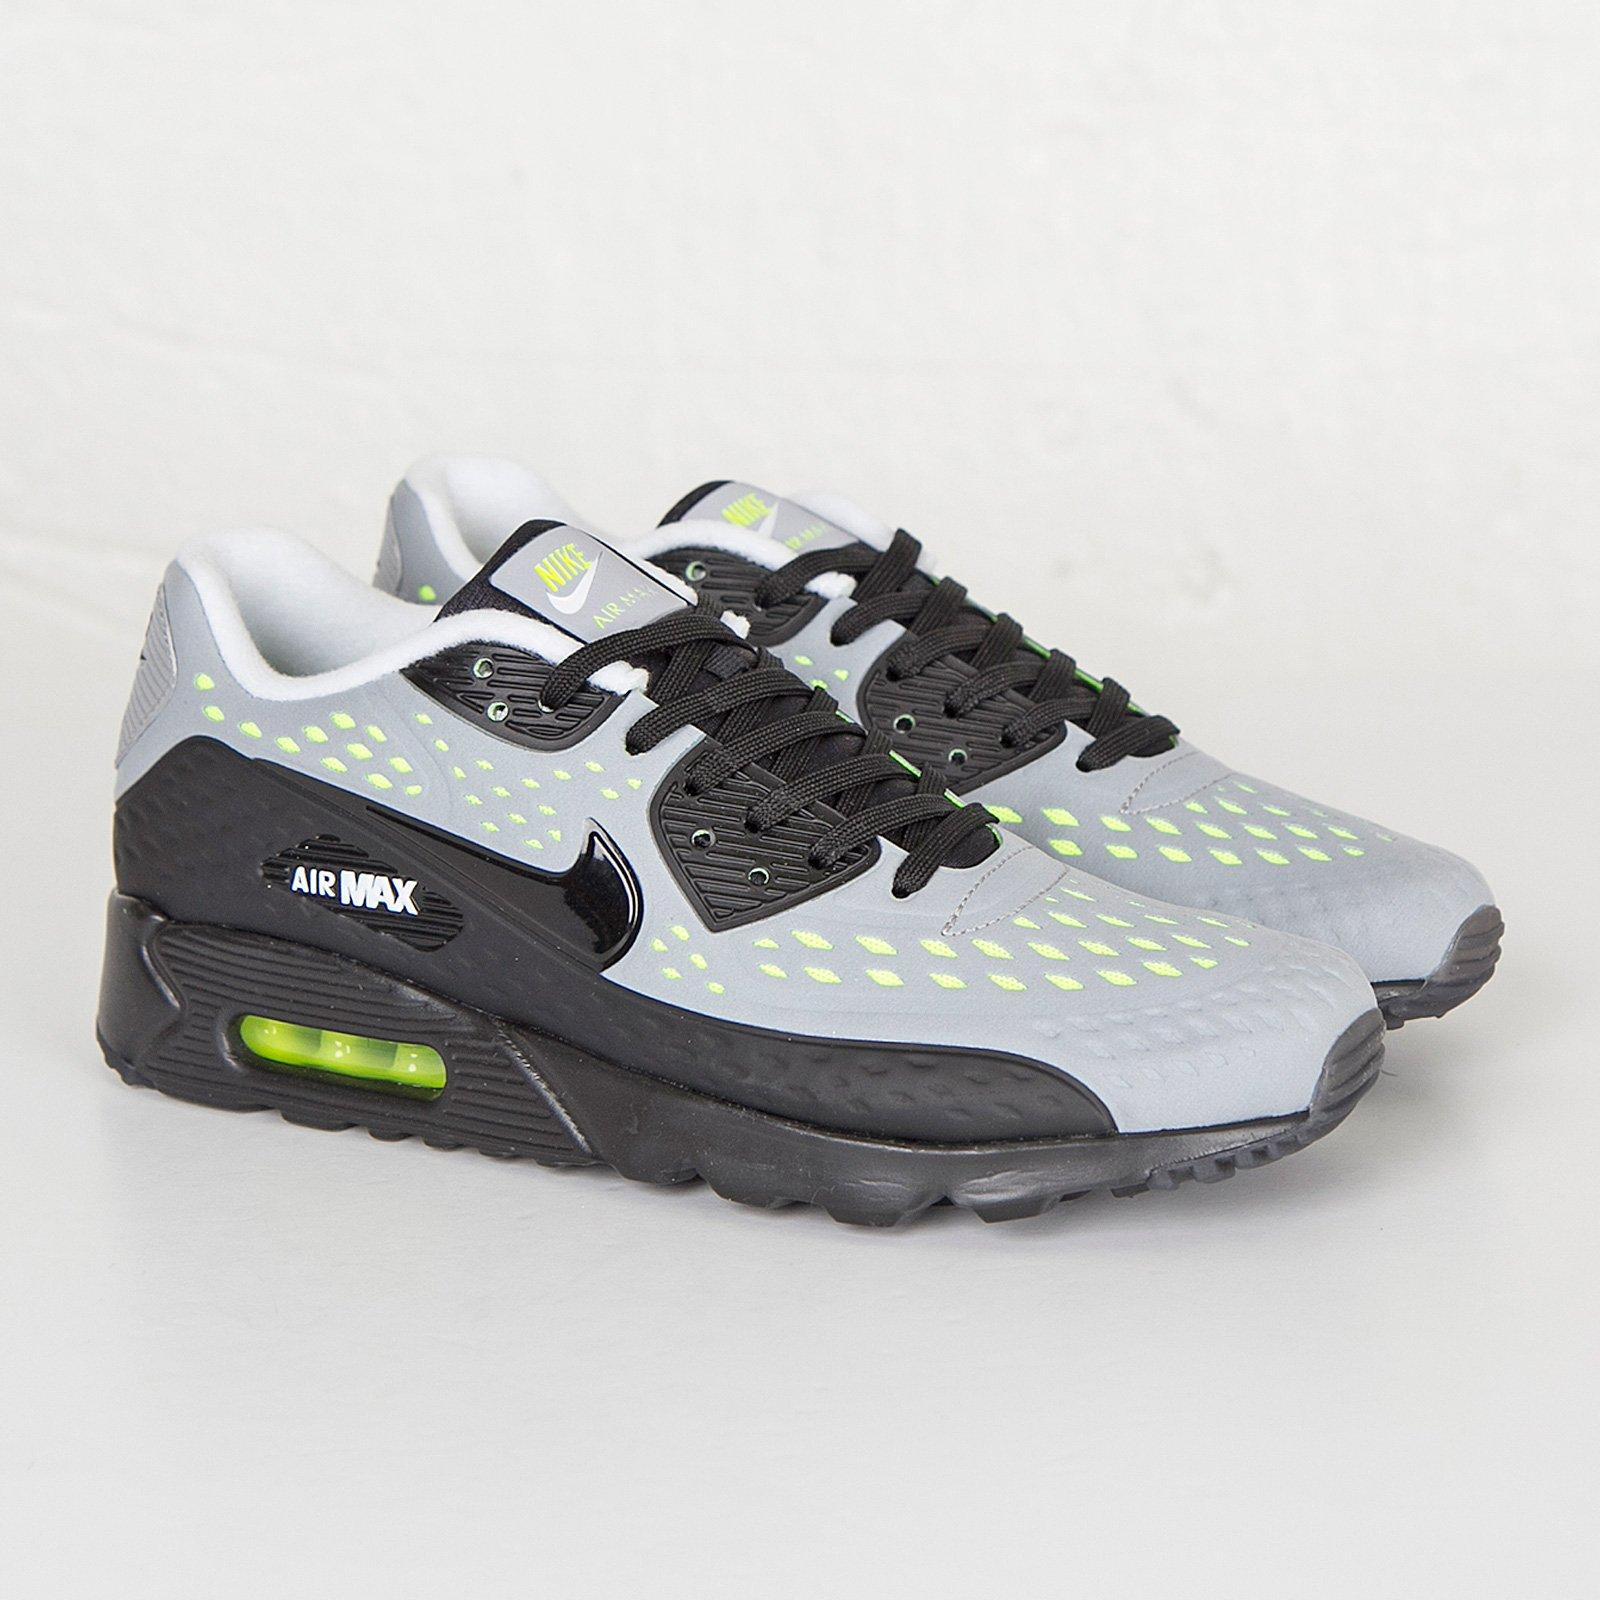 check out 8b5bf e1268 Nike Air Max 90 Ultra Br